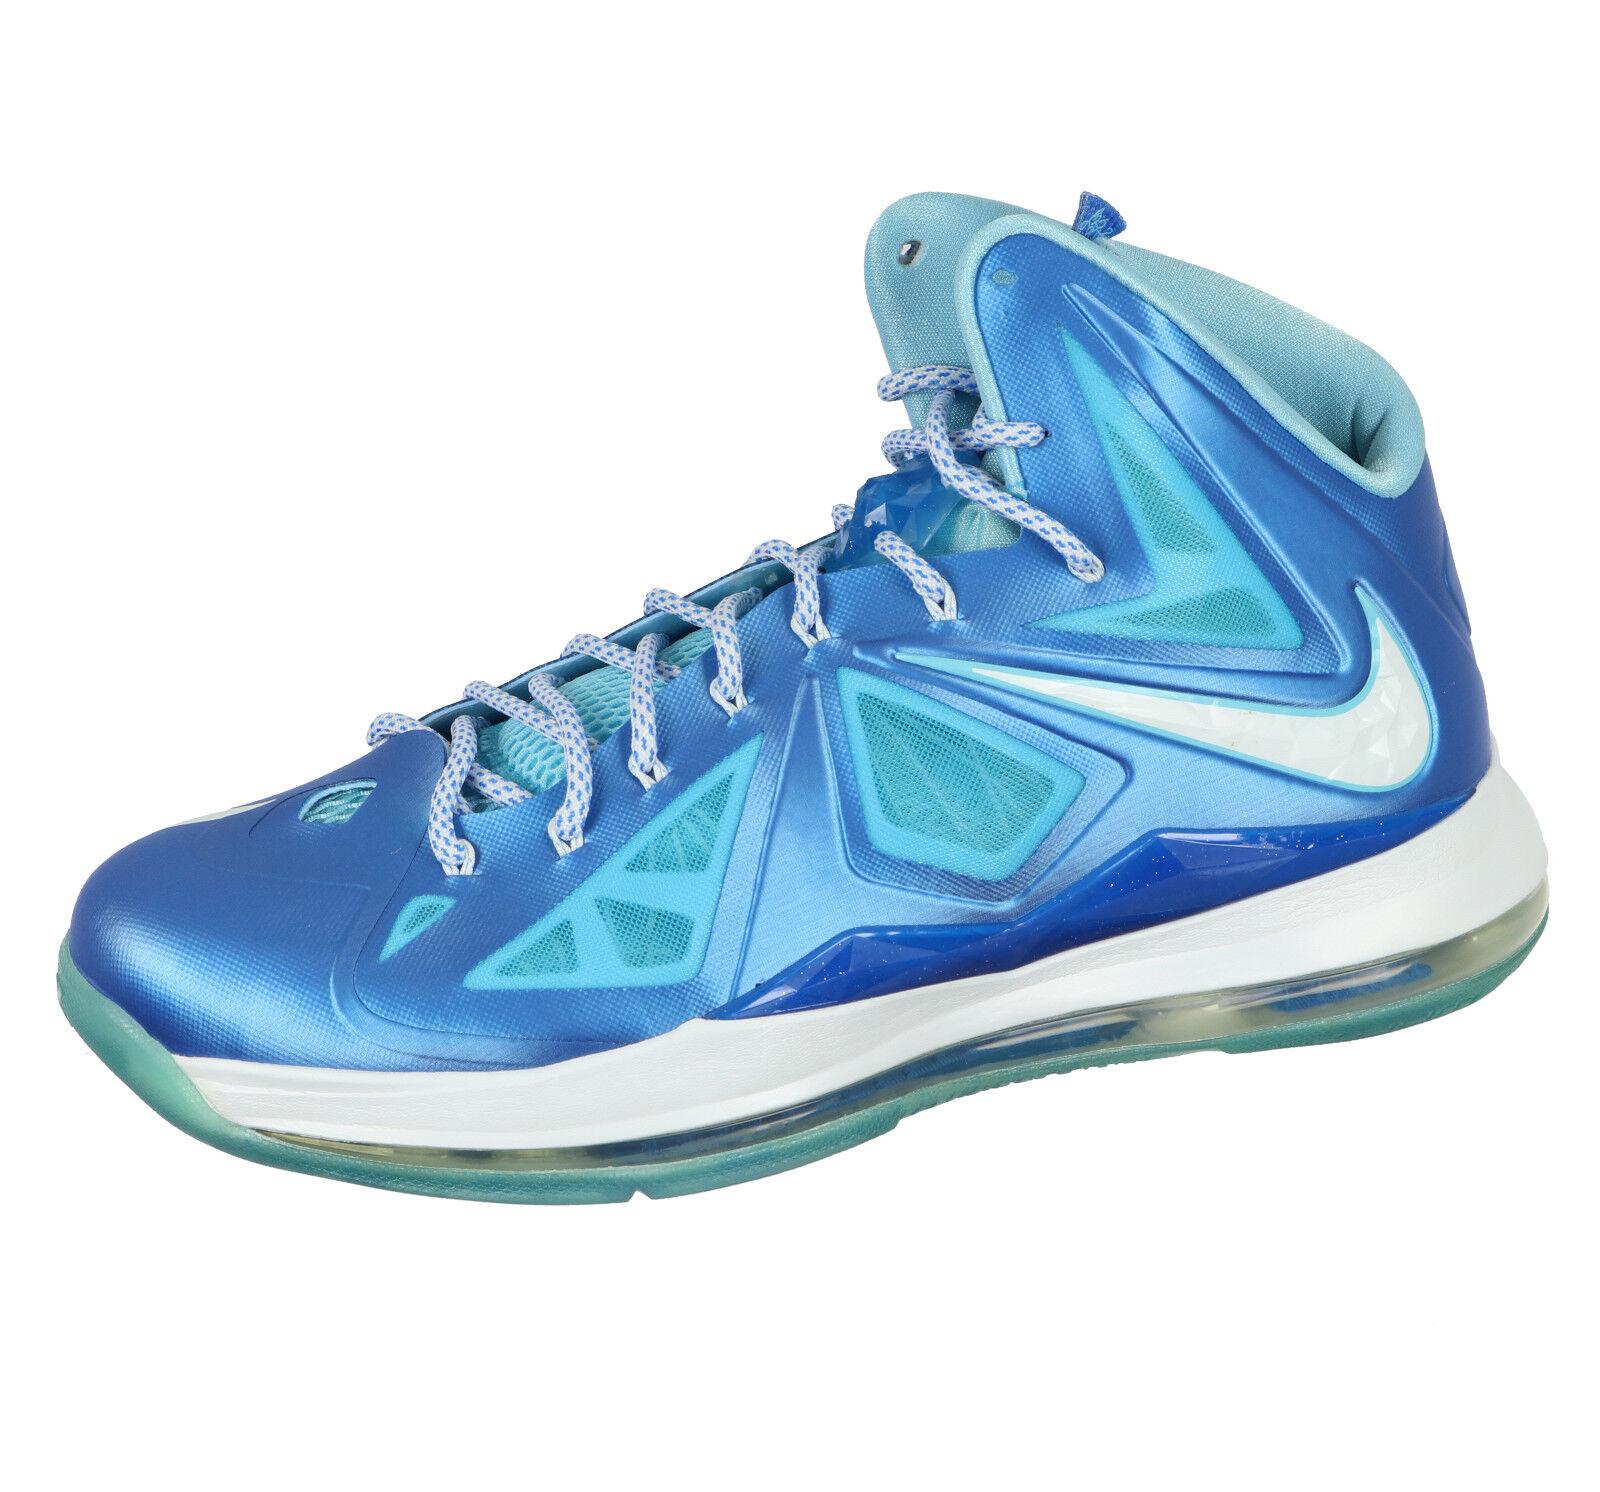 NIKE Lebron X+ Basketball Shoes sz 14 Photo Blue Windchill Blue Diamond 10 Elite